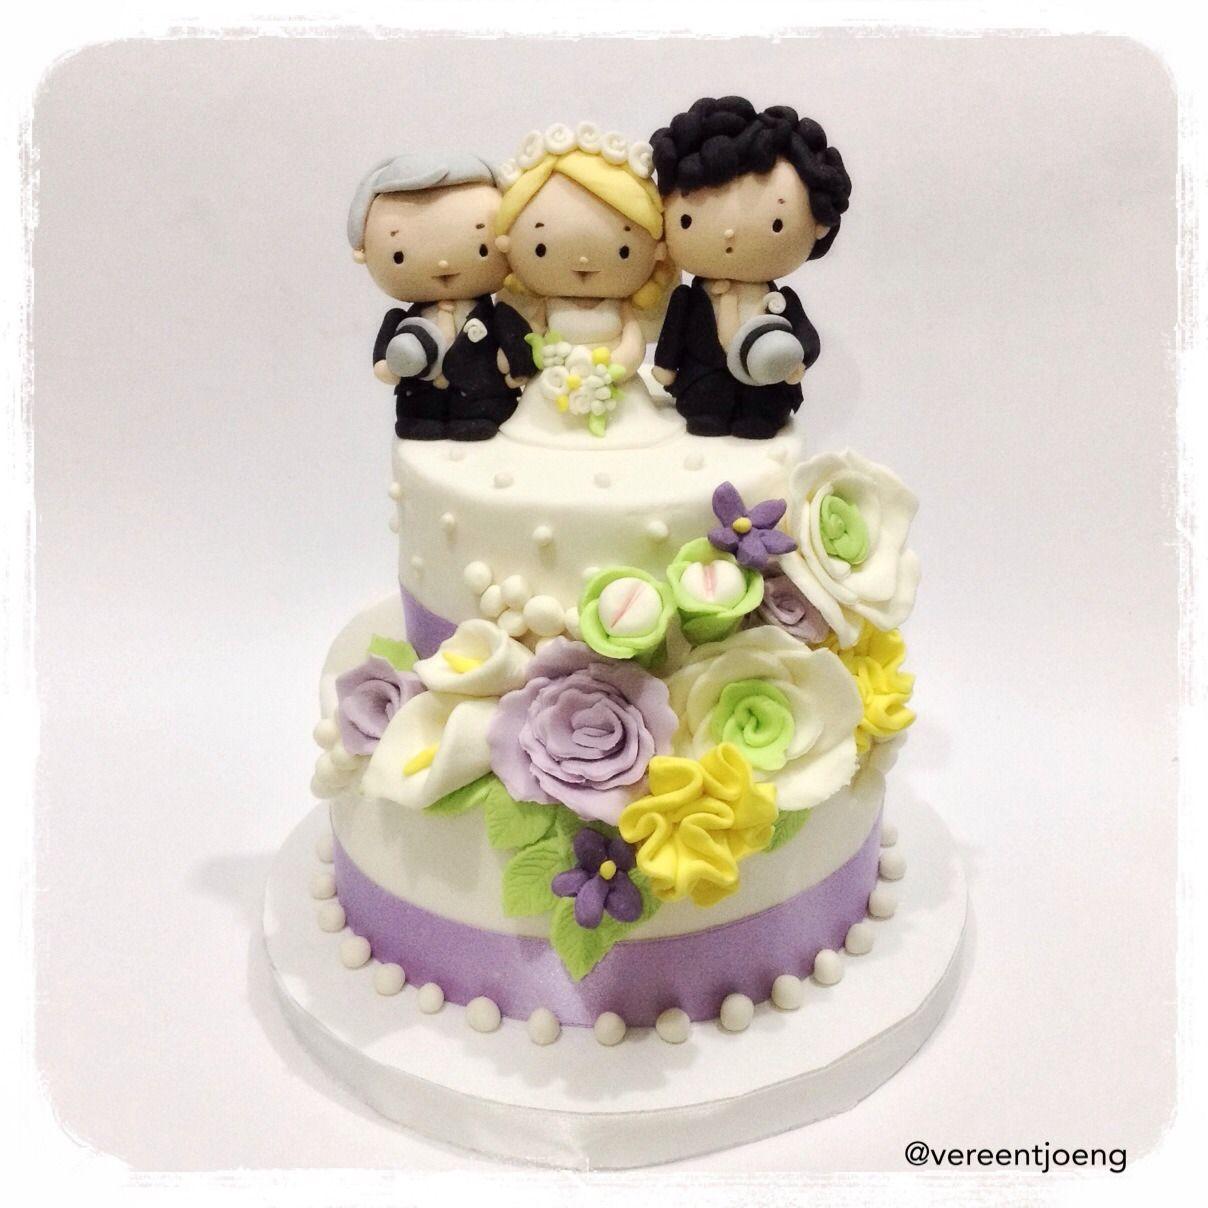 Cumbercupcakes — The Wedding Cake from \